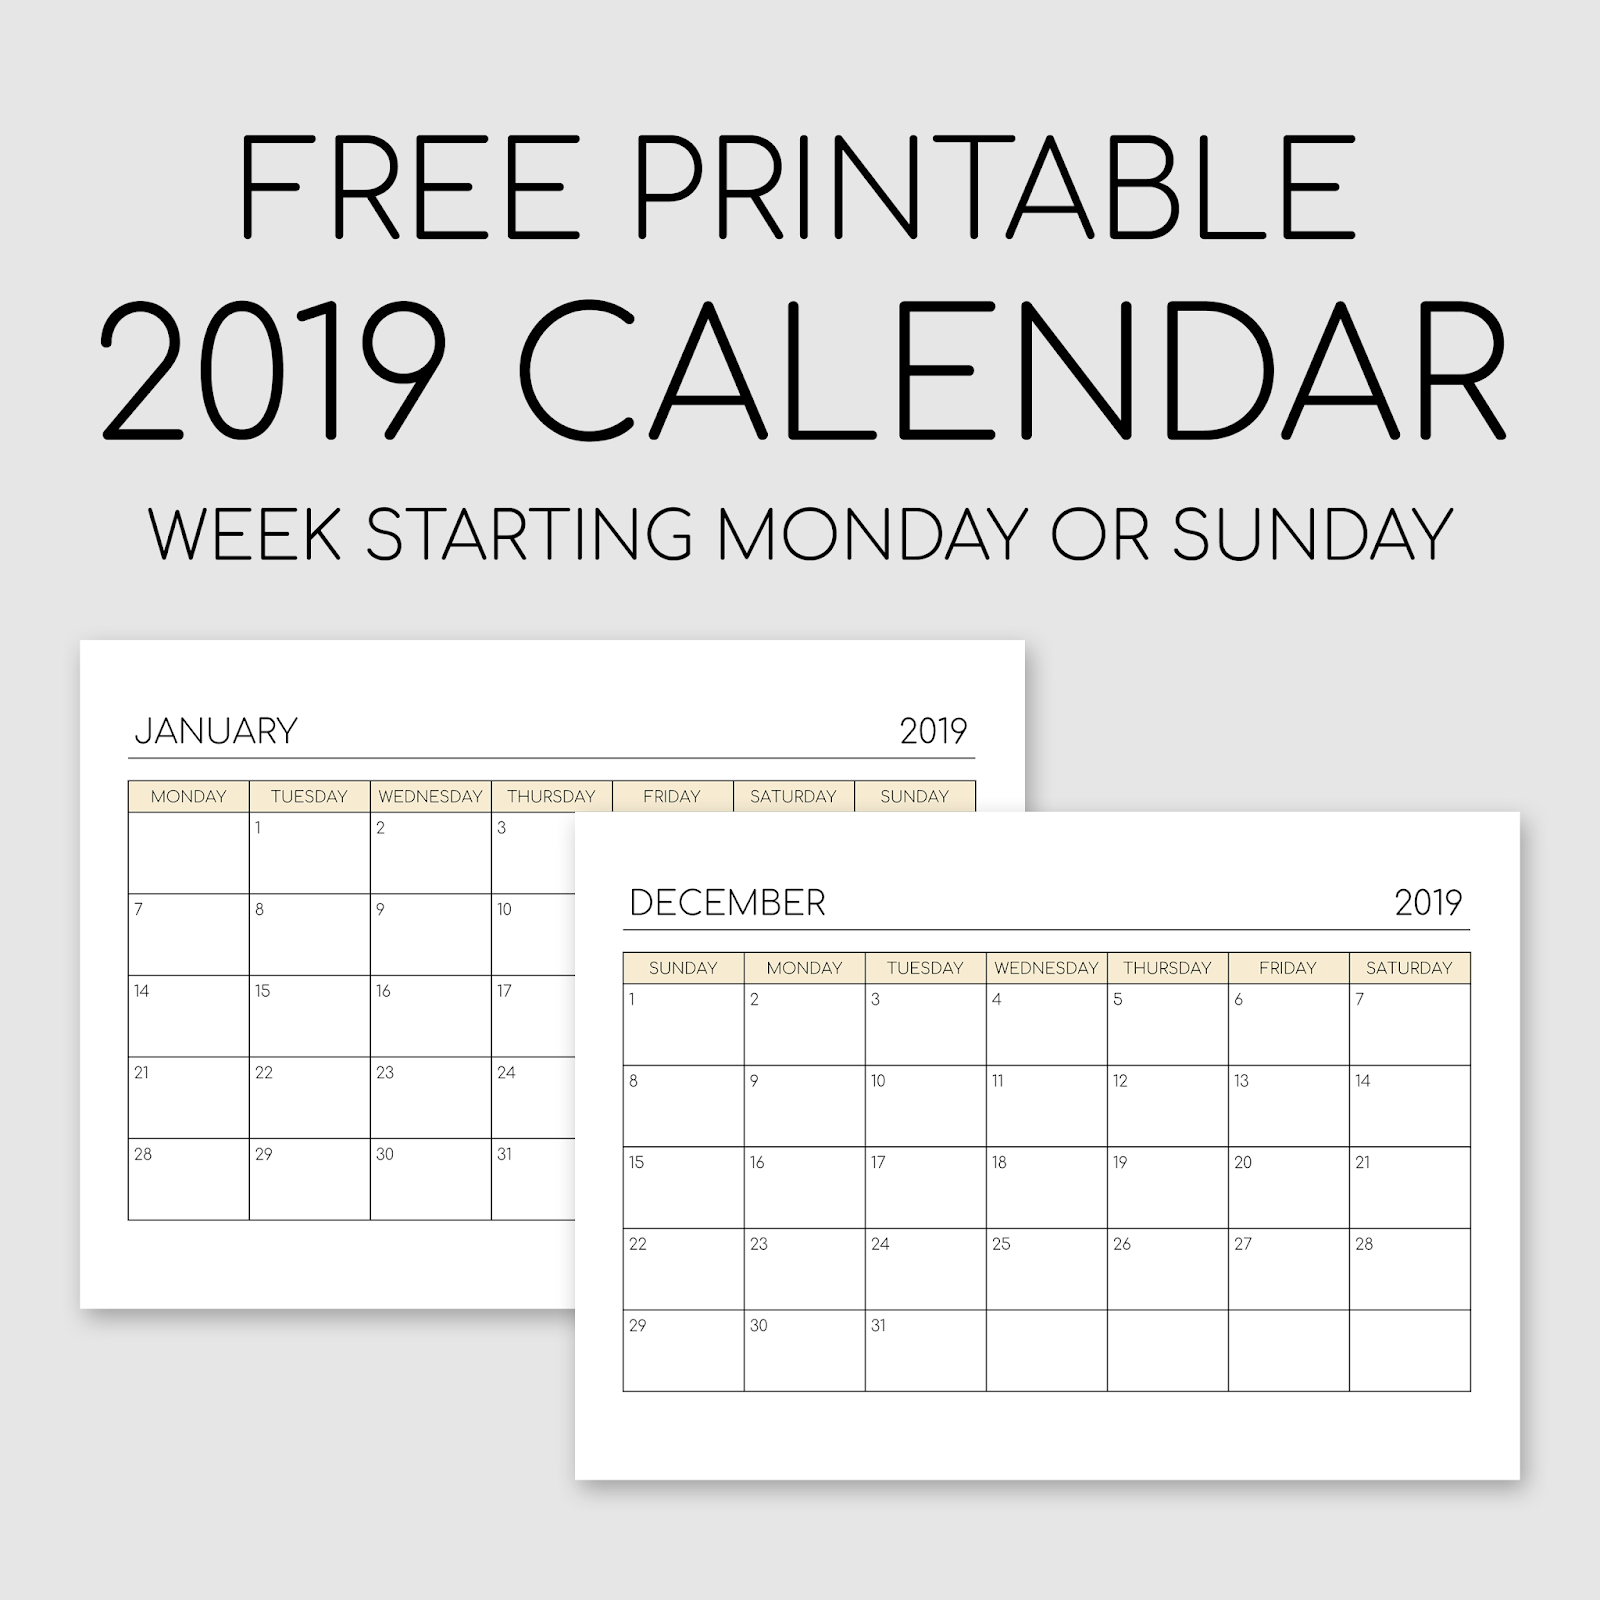 Printable 2019 Calendar - Landscape Orientation